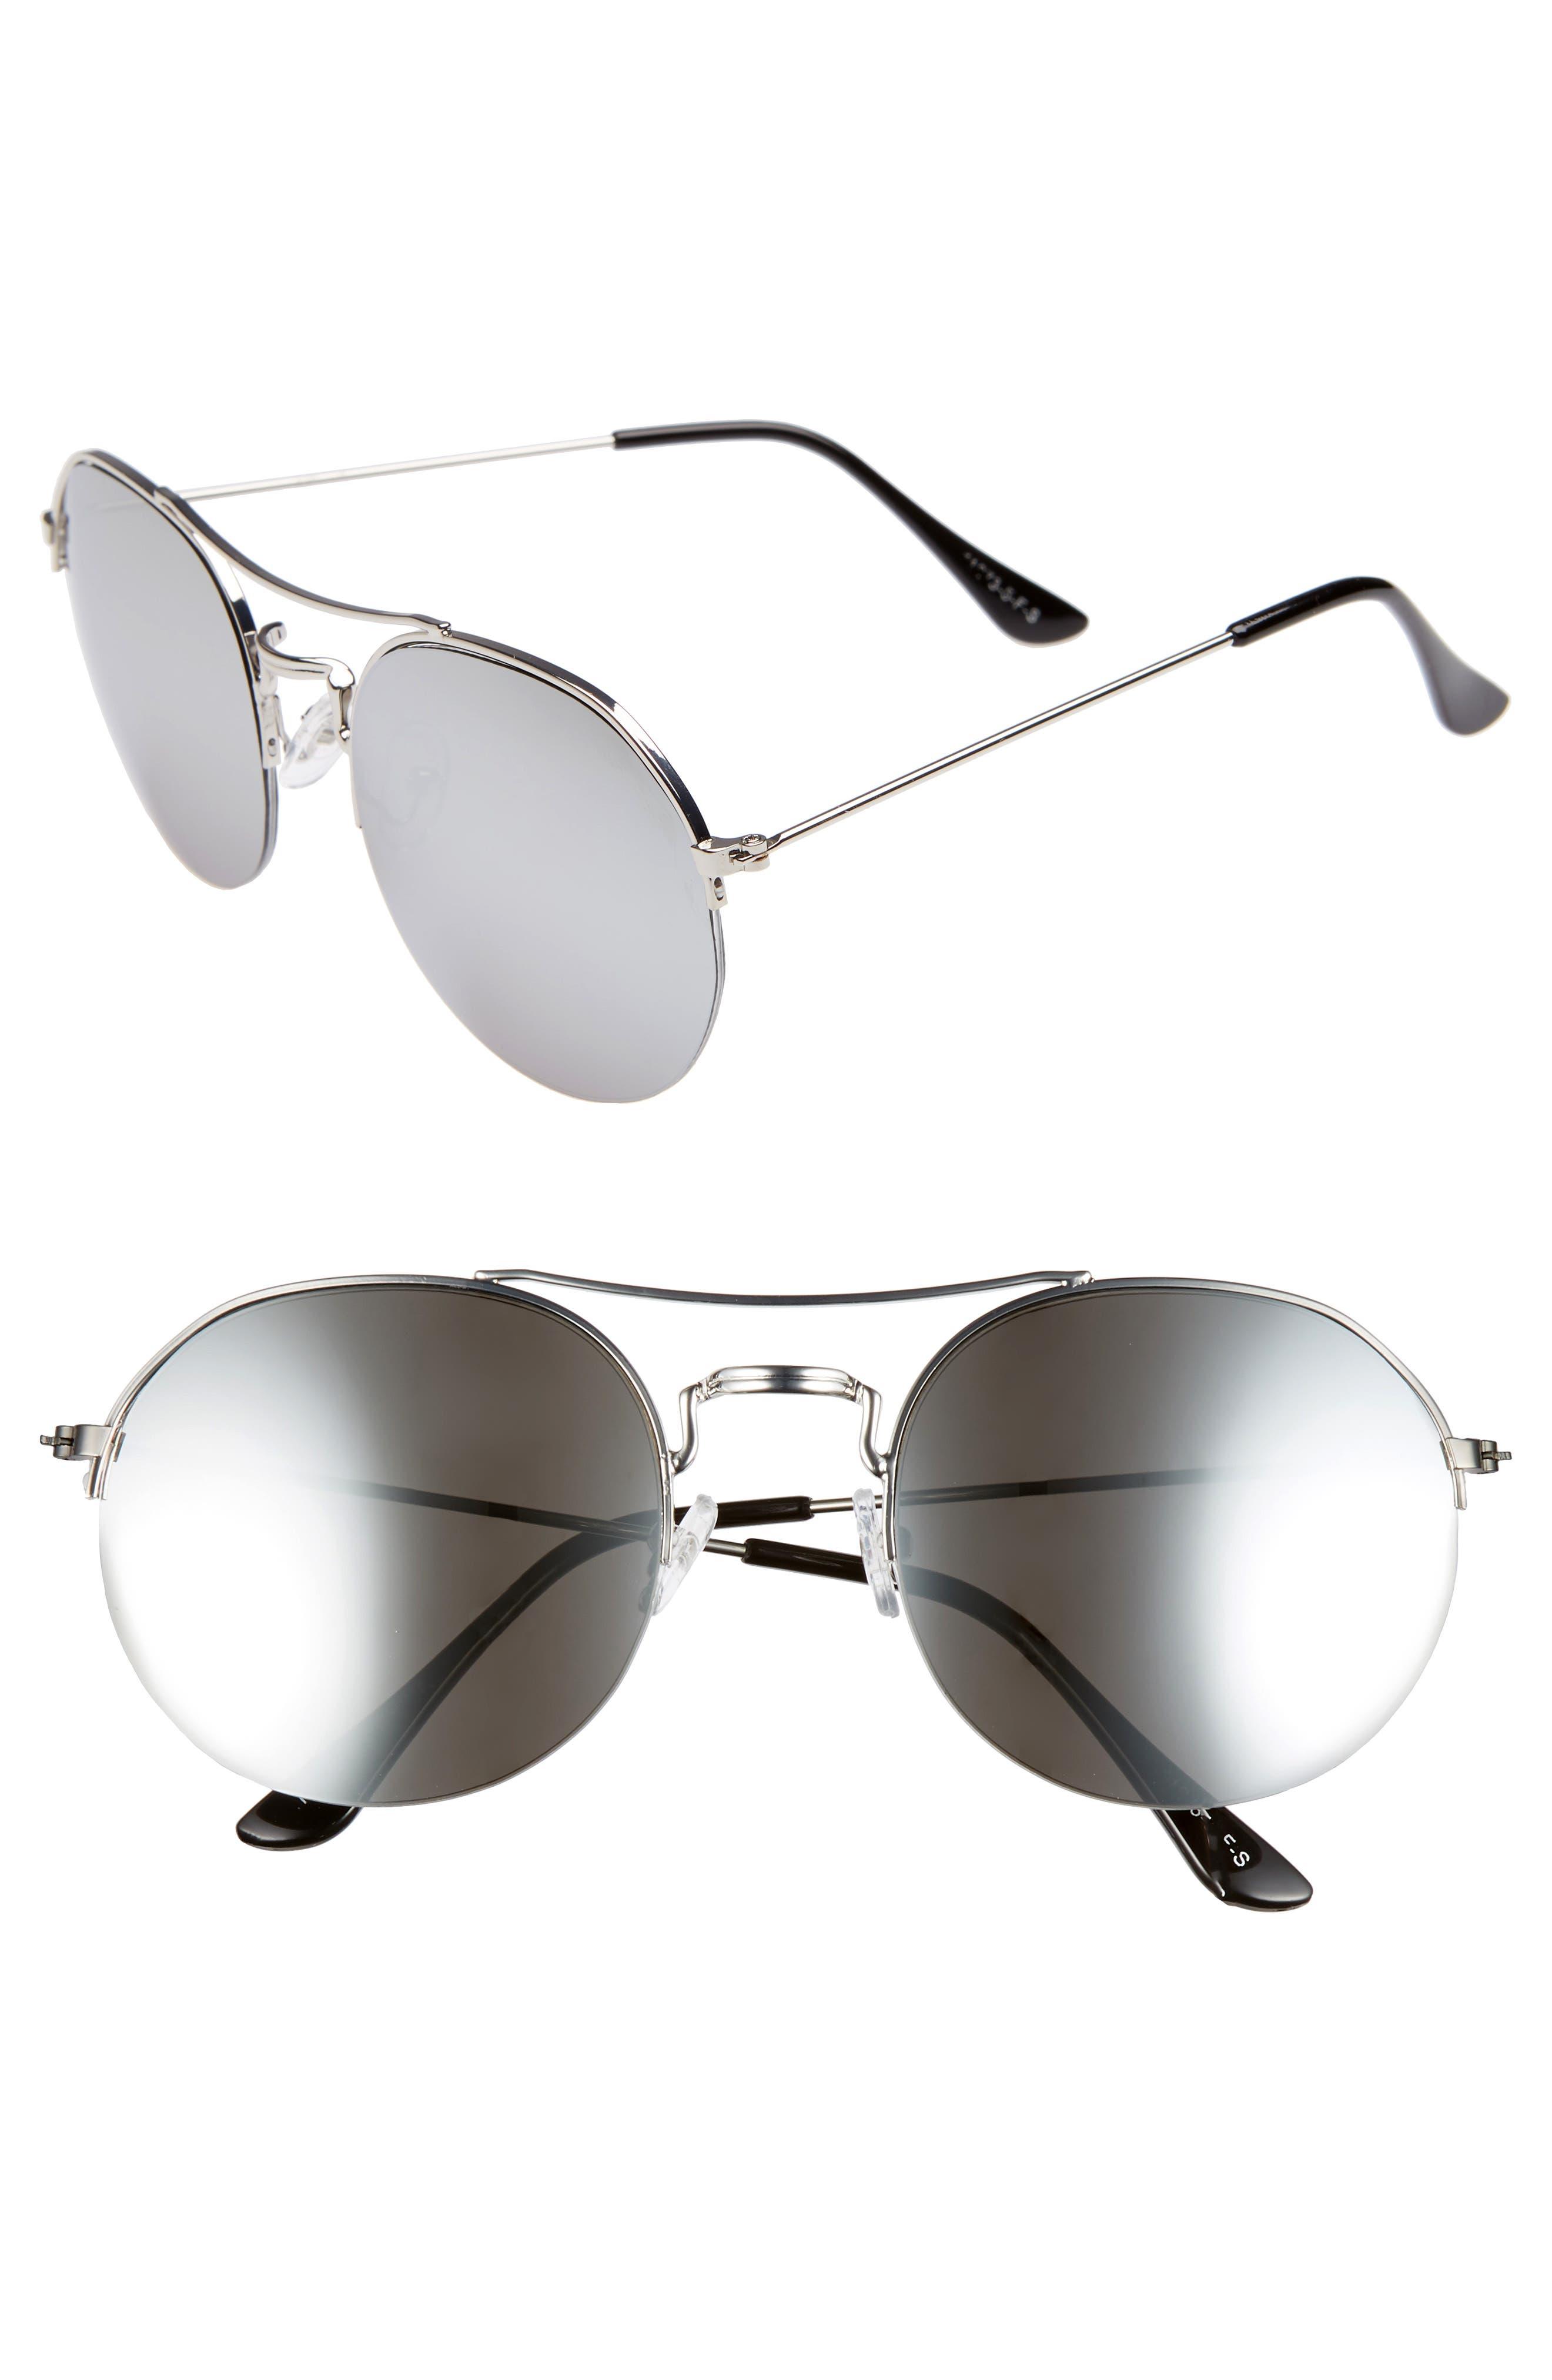 55mm Round Metal Aviator Sunglasses,                         Main,                         color, DARK GREY